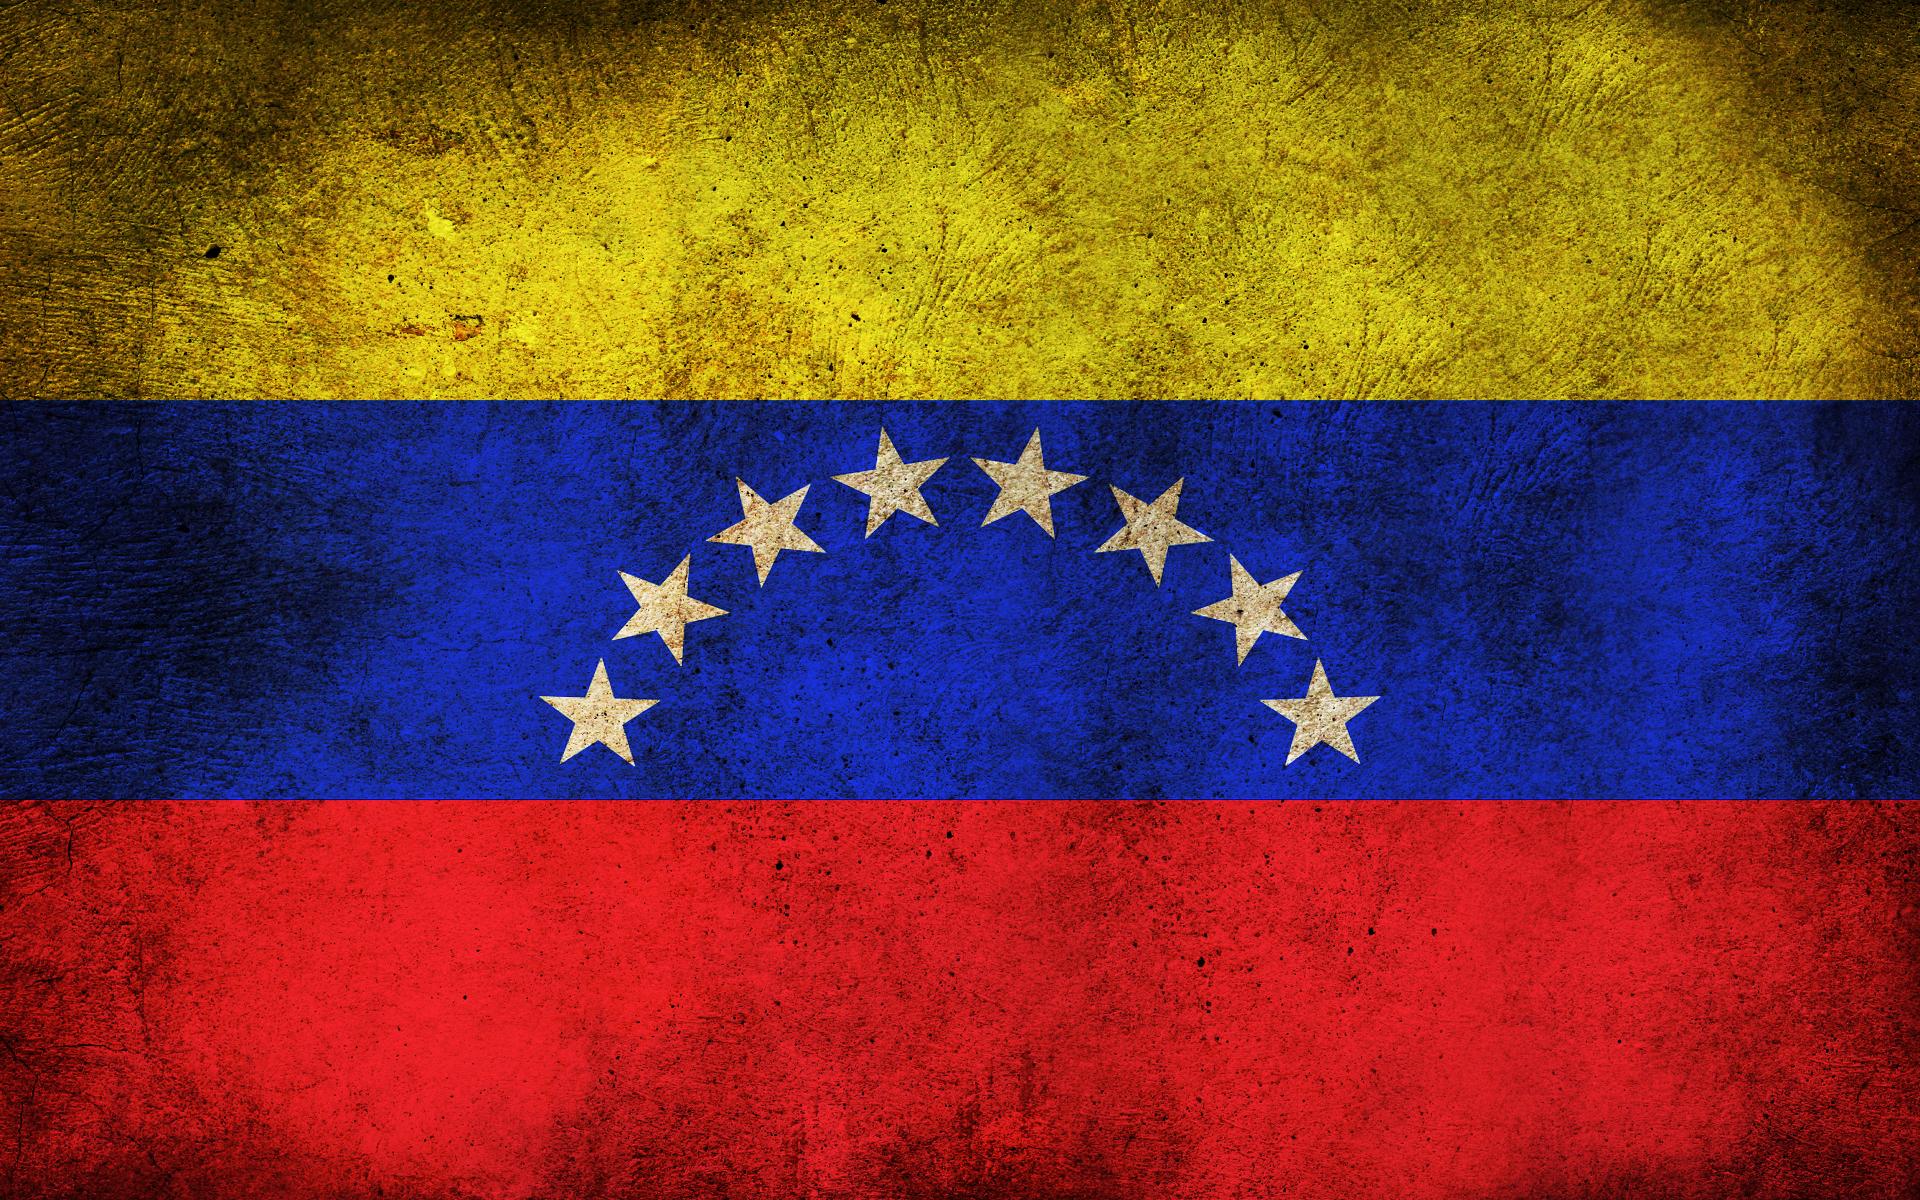 Wallpapers de venezuela the cluster - Fotos banera ...